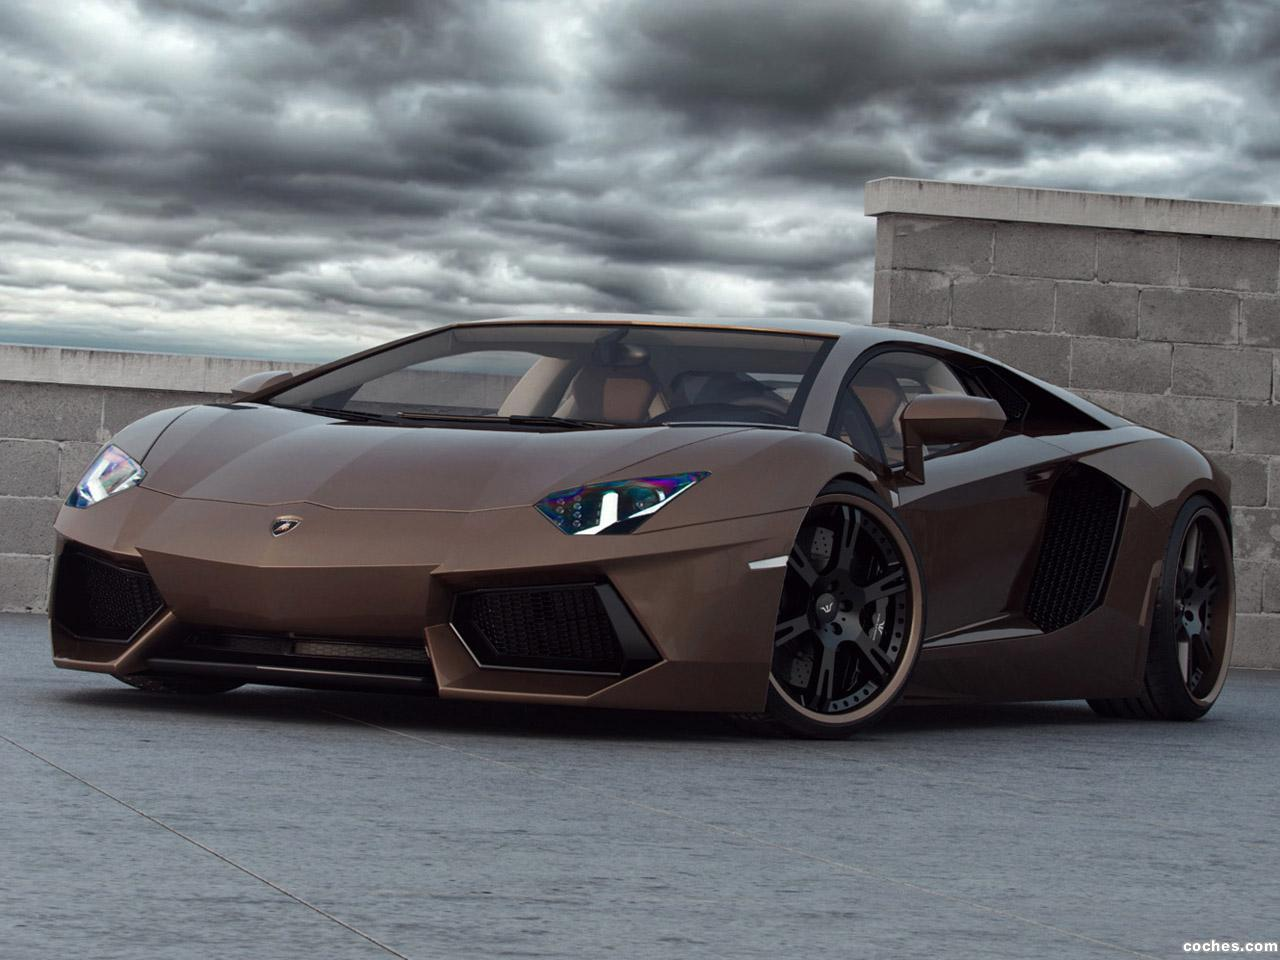 Foto 0 de Wheelsandmore Lamborghini Aventador Rabbioso 2012